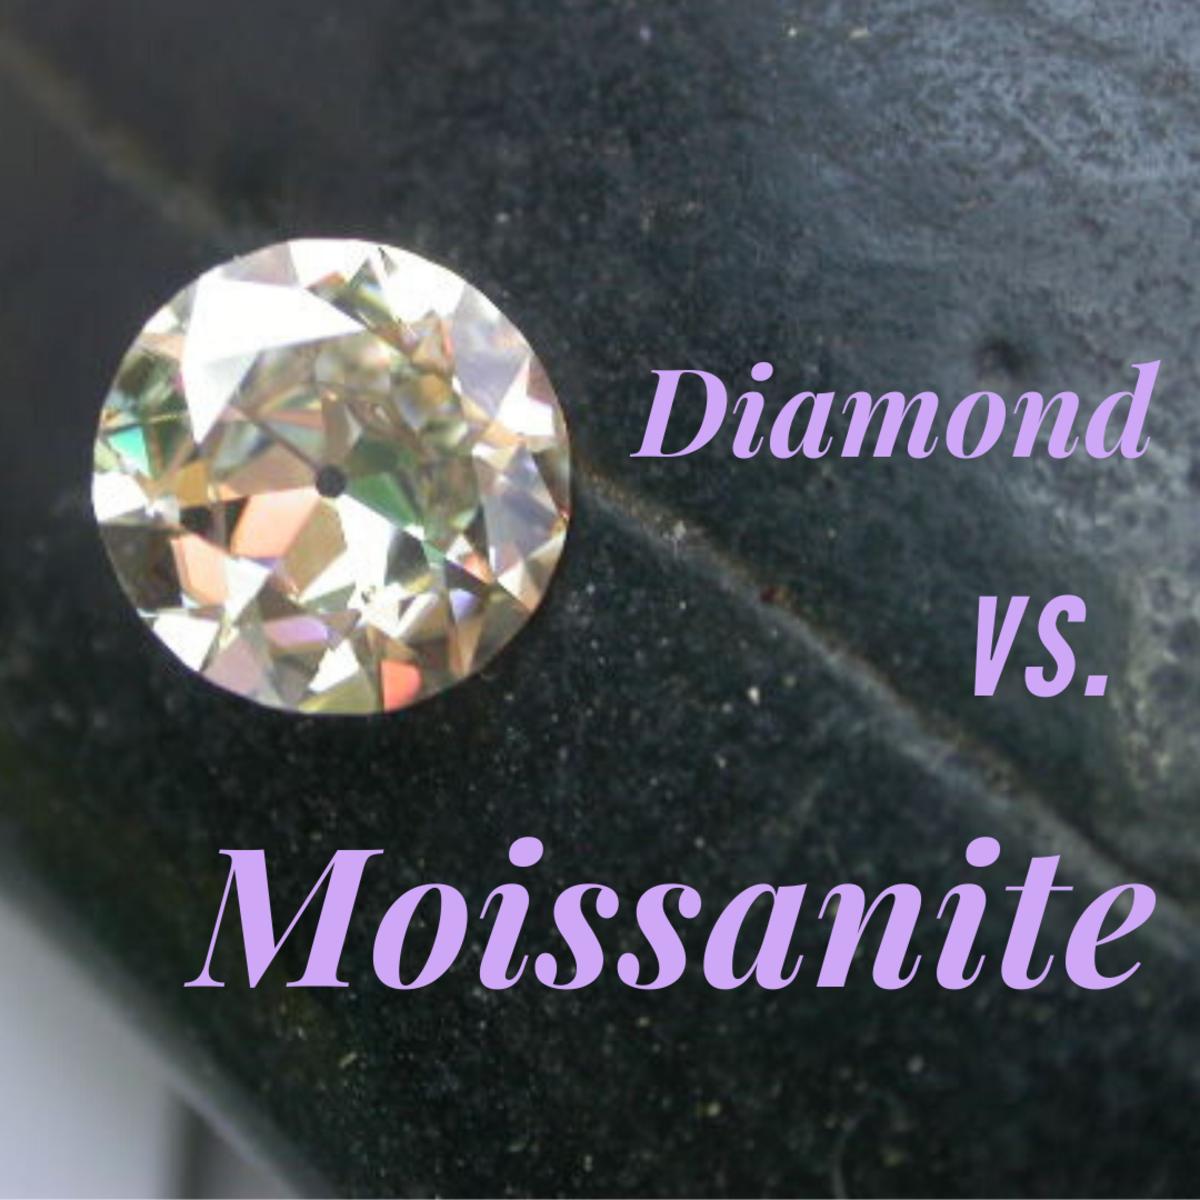 Is moissanite a good alternative to diamond jewelry?